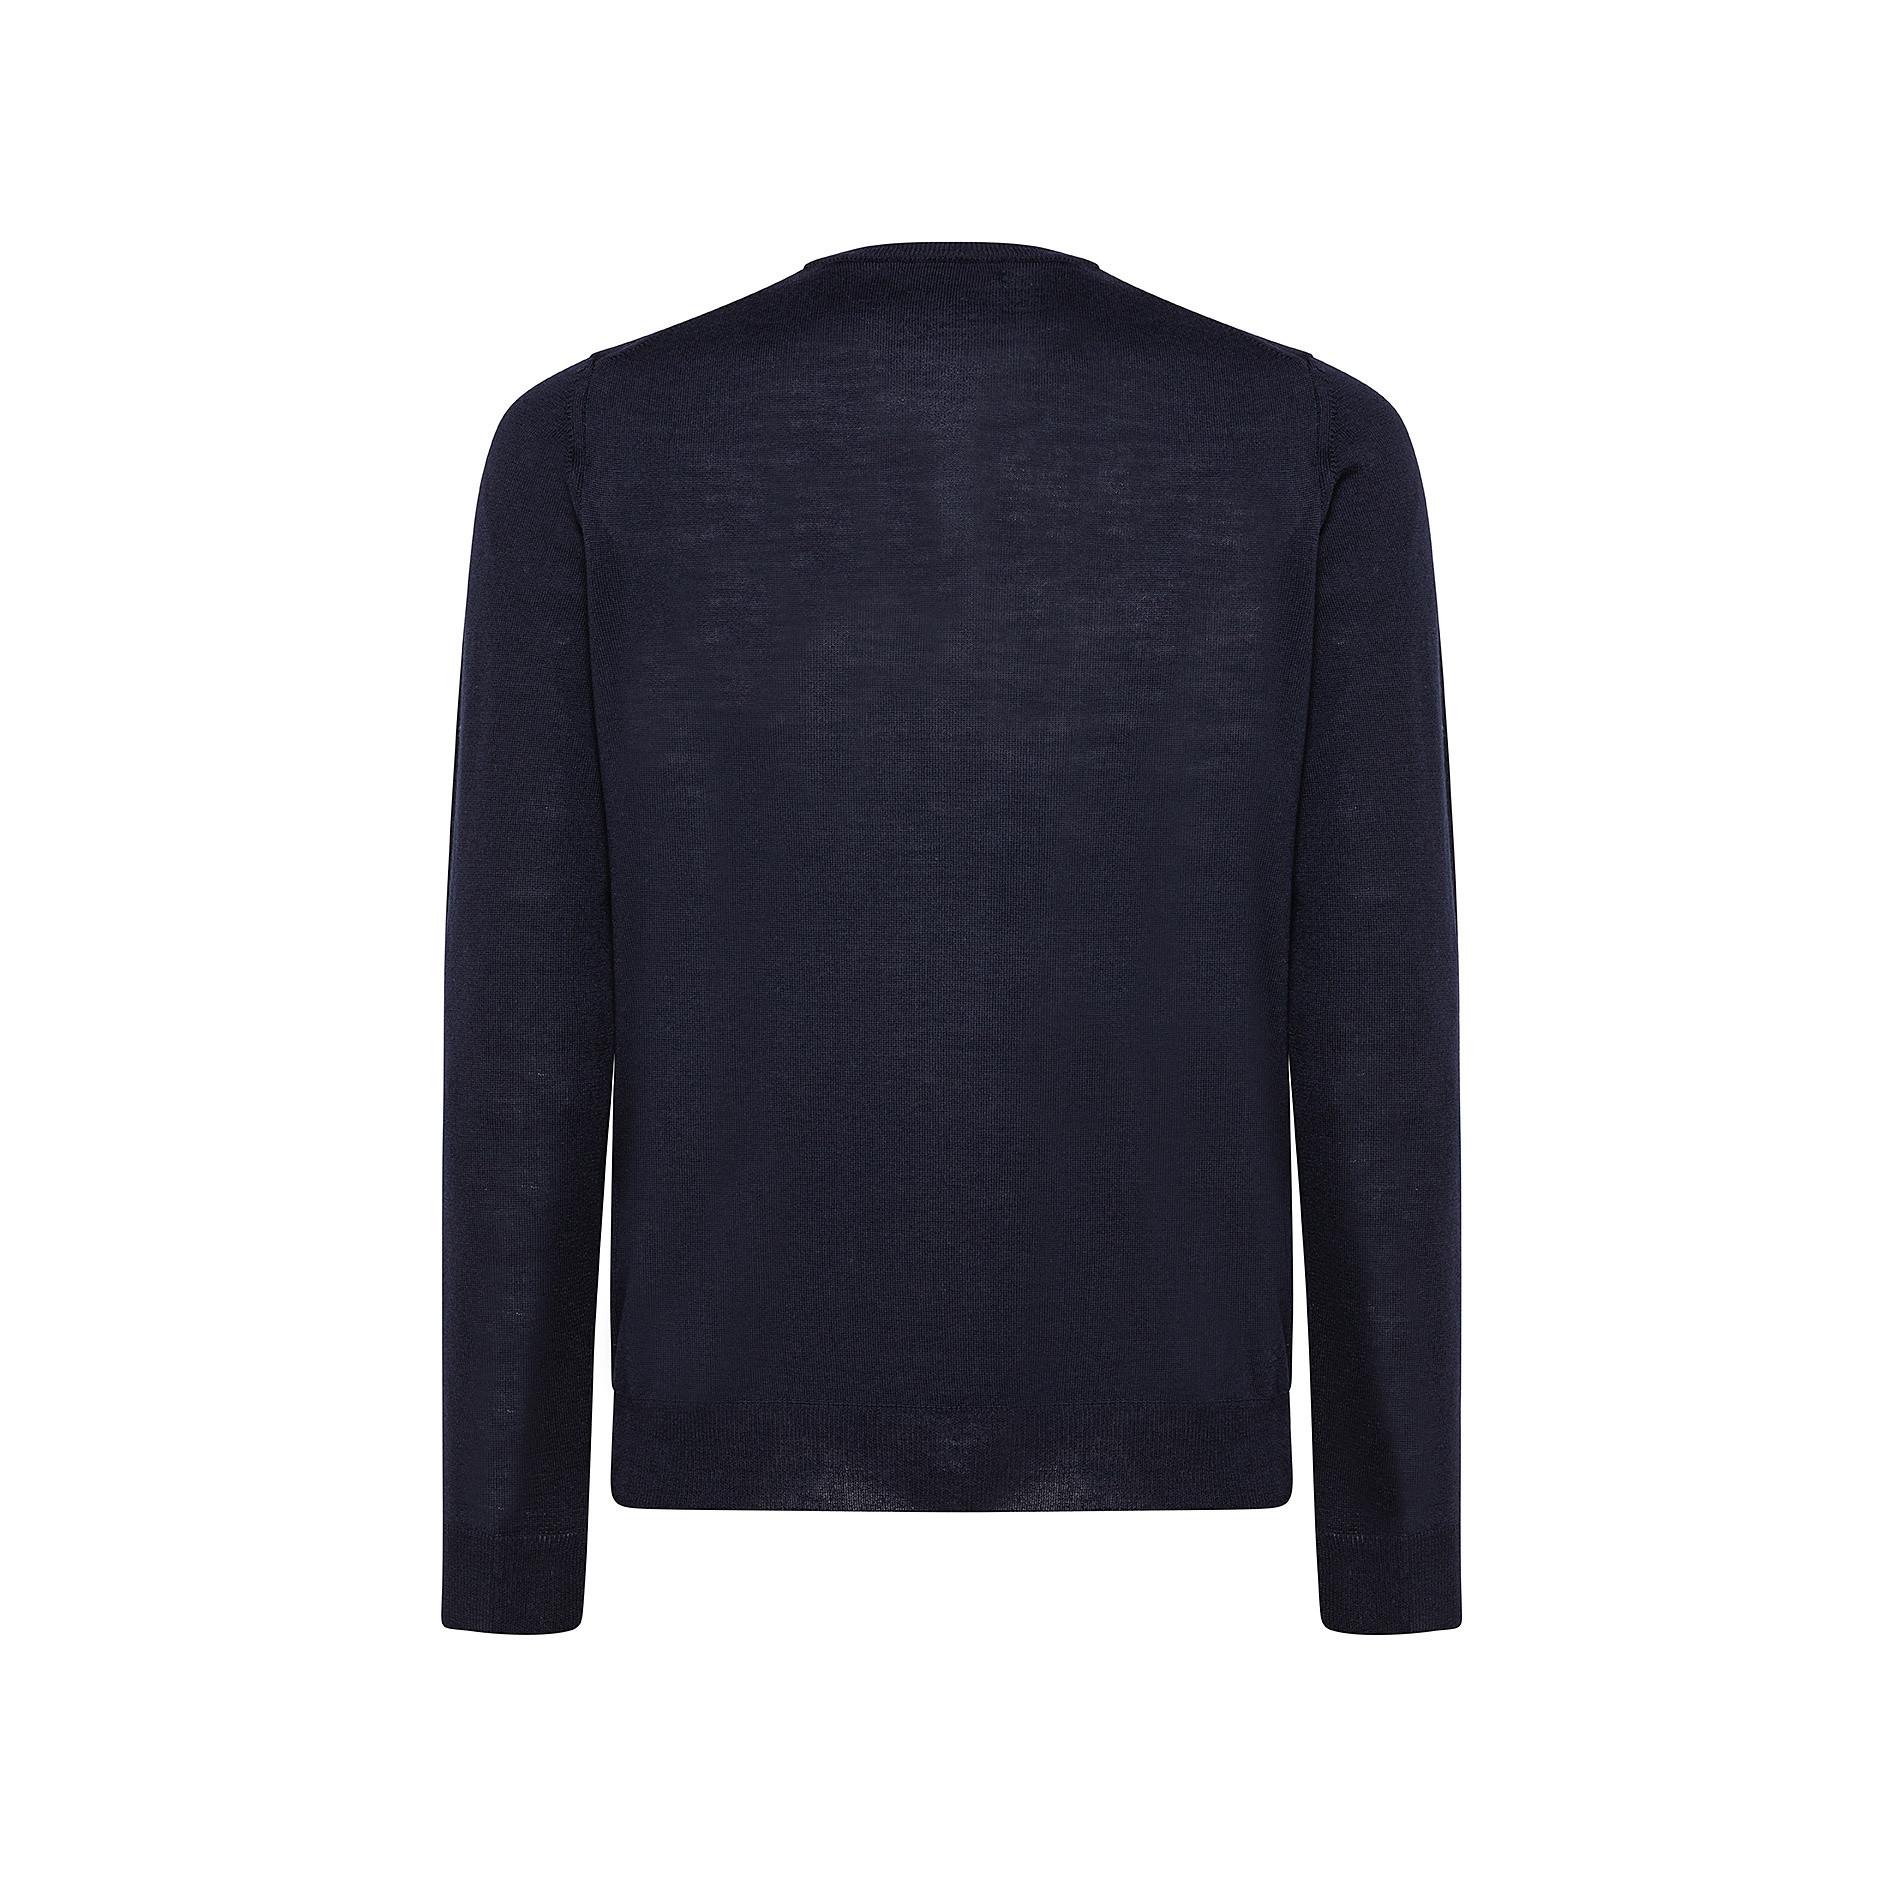 Pullover girocollo lana merinos extrafine, Blu, large image number 1